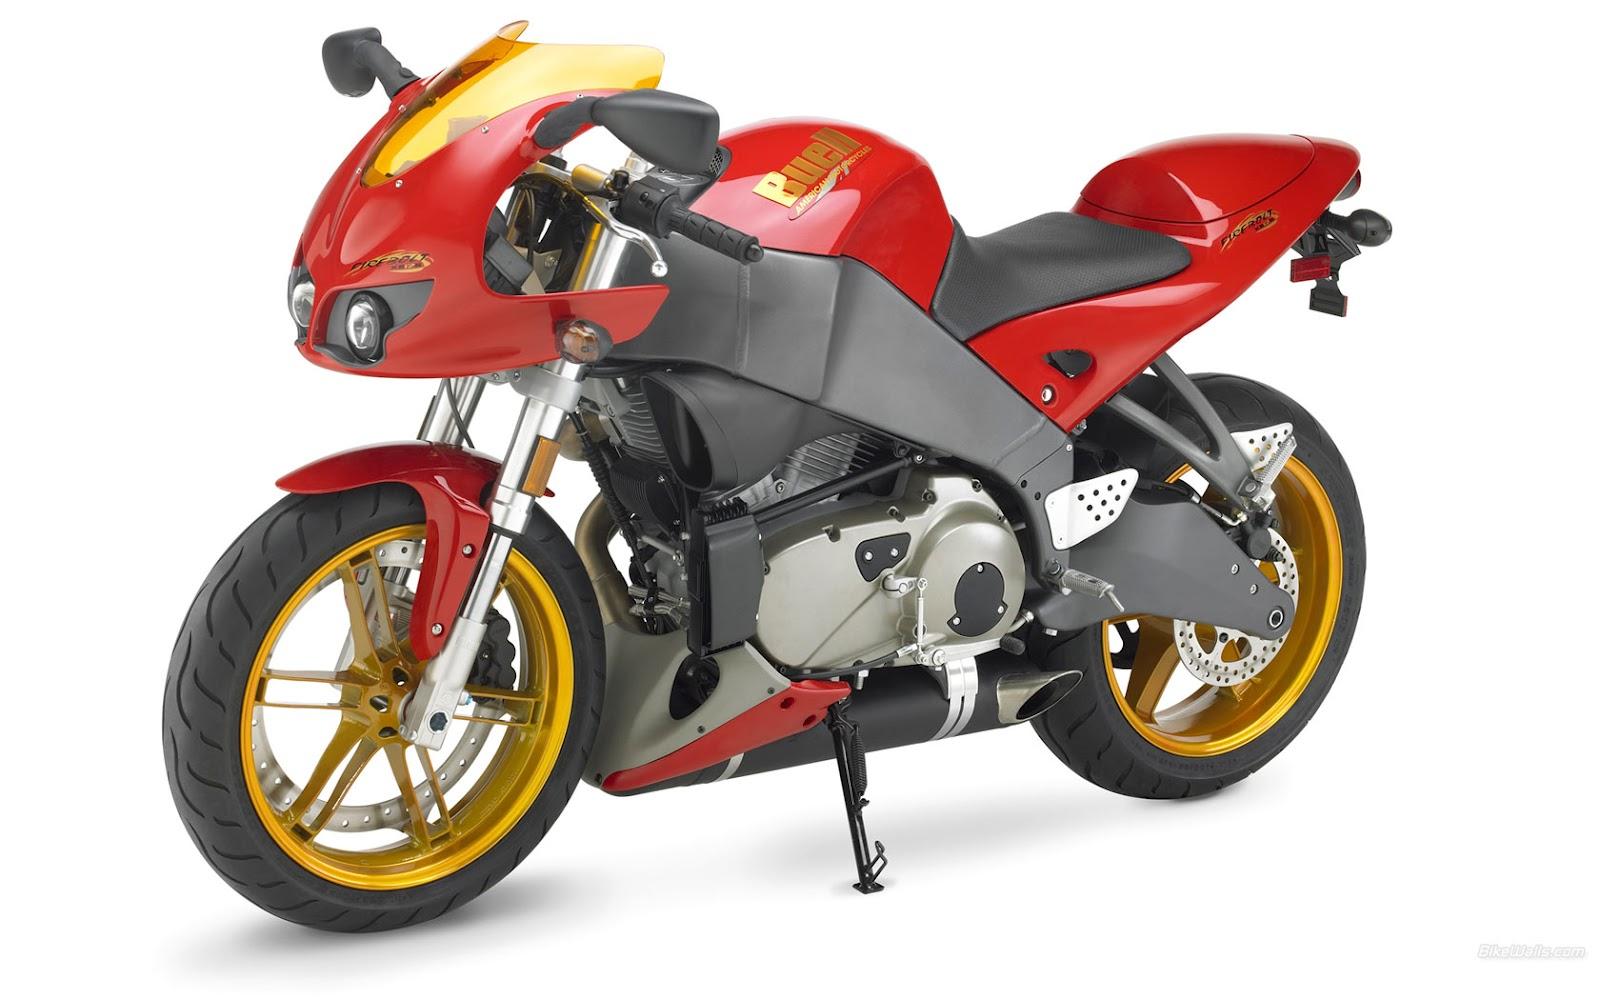 http://2.bp.blogspot.com/-i8aHoNSGxVs/T0qPbAmDoSI/AAAAAAAAA-k/OMYkq31w5qo/s1600/HD+Mix+Bikes+2012+%25282%2529.jpg